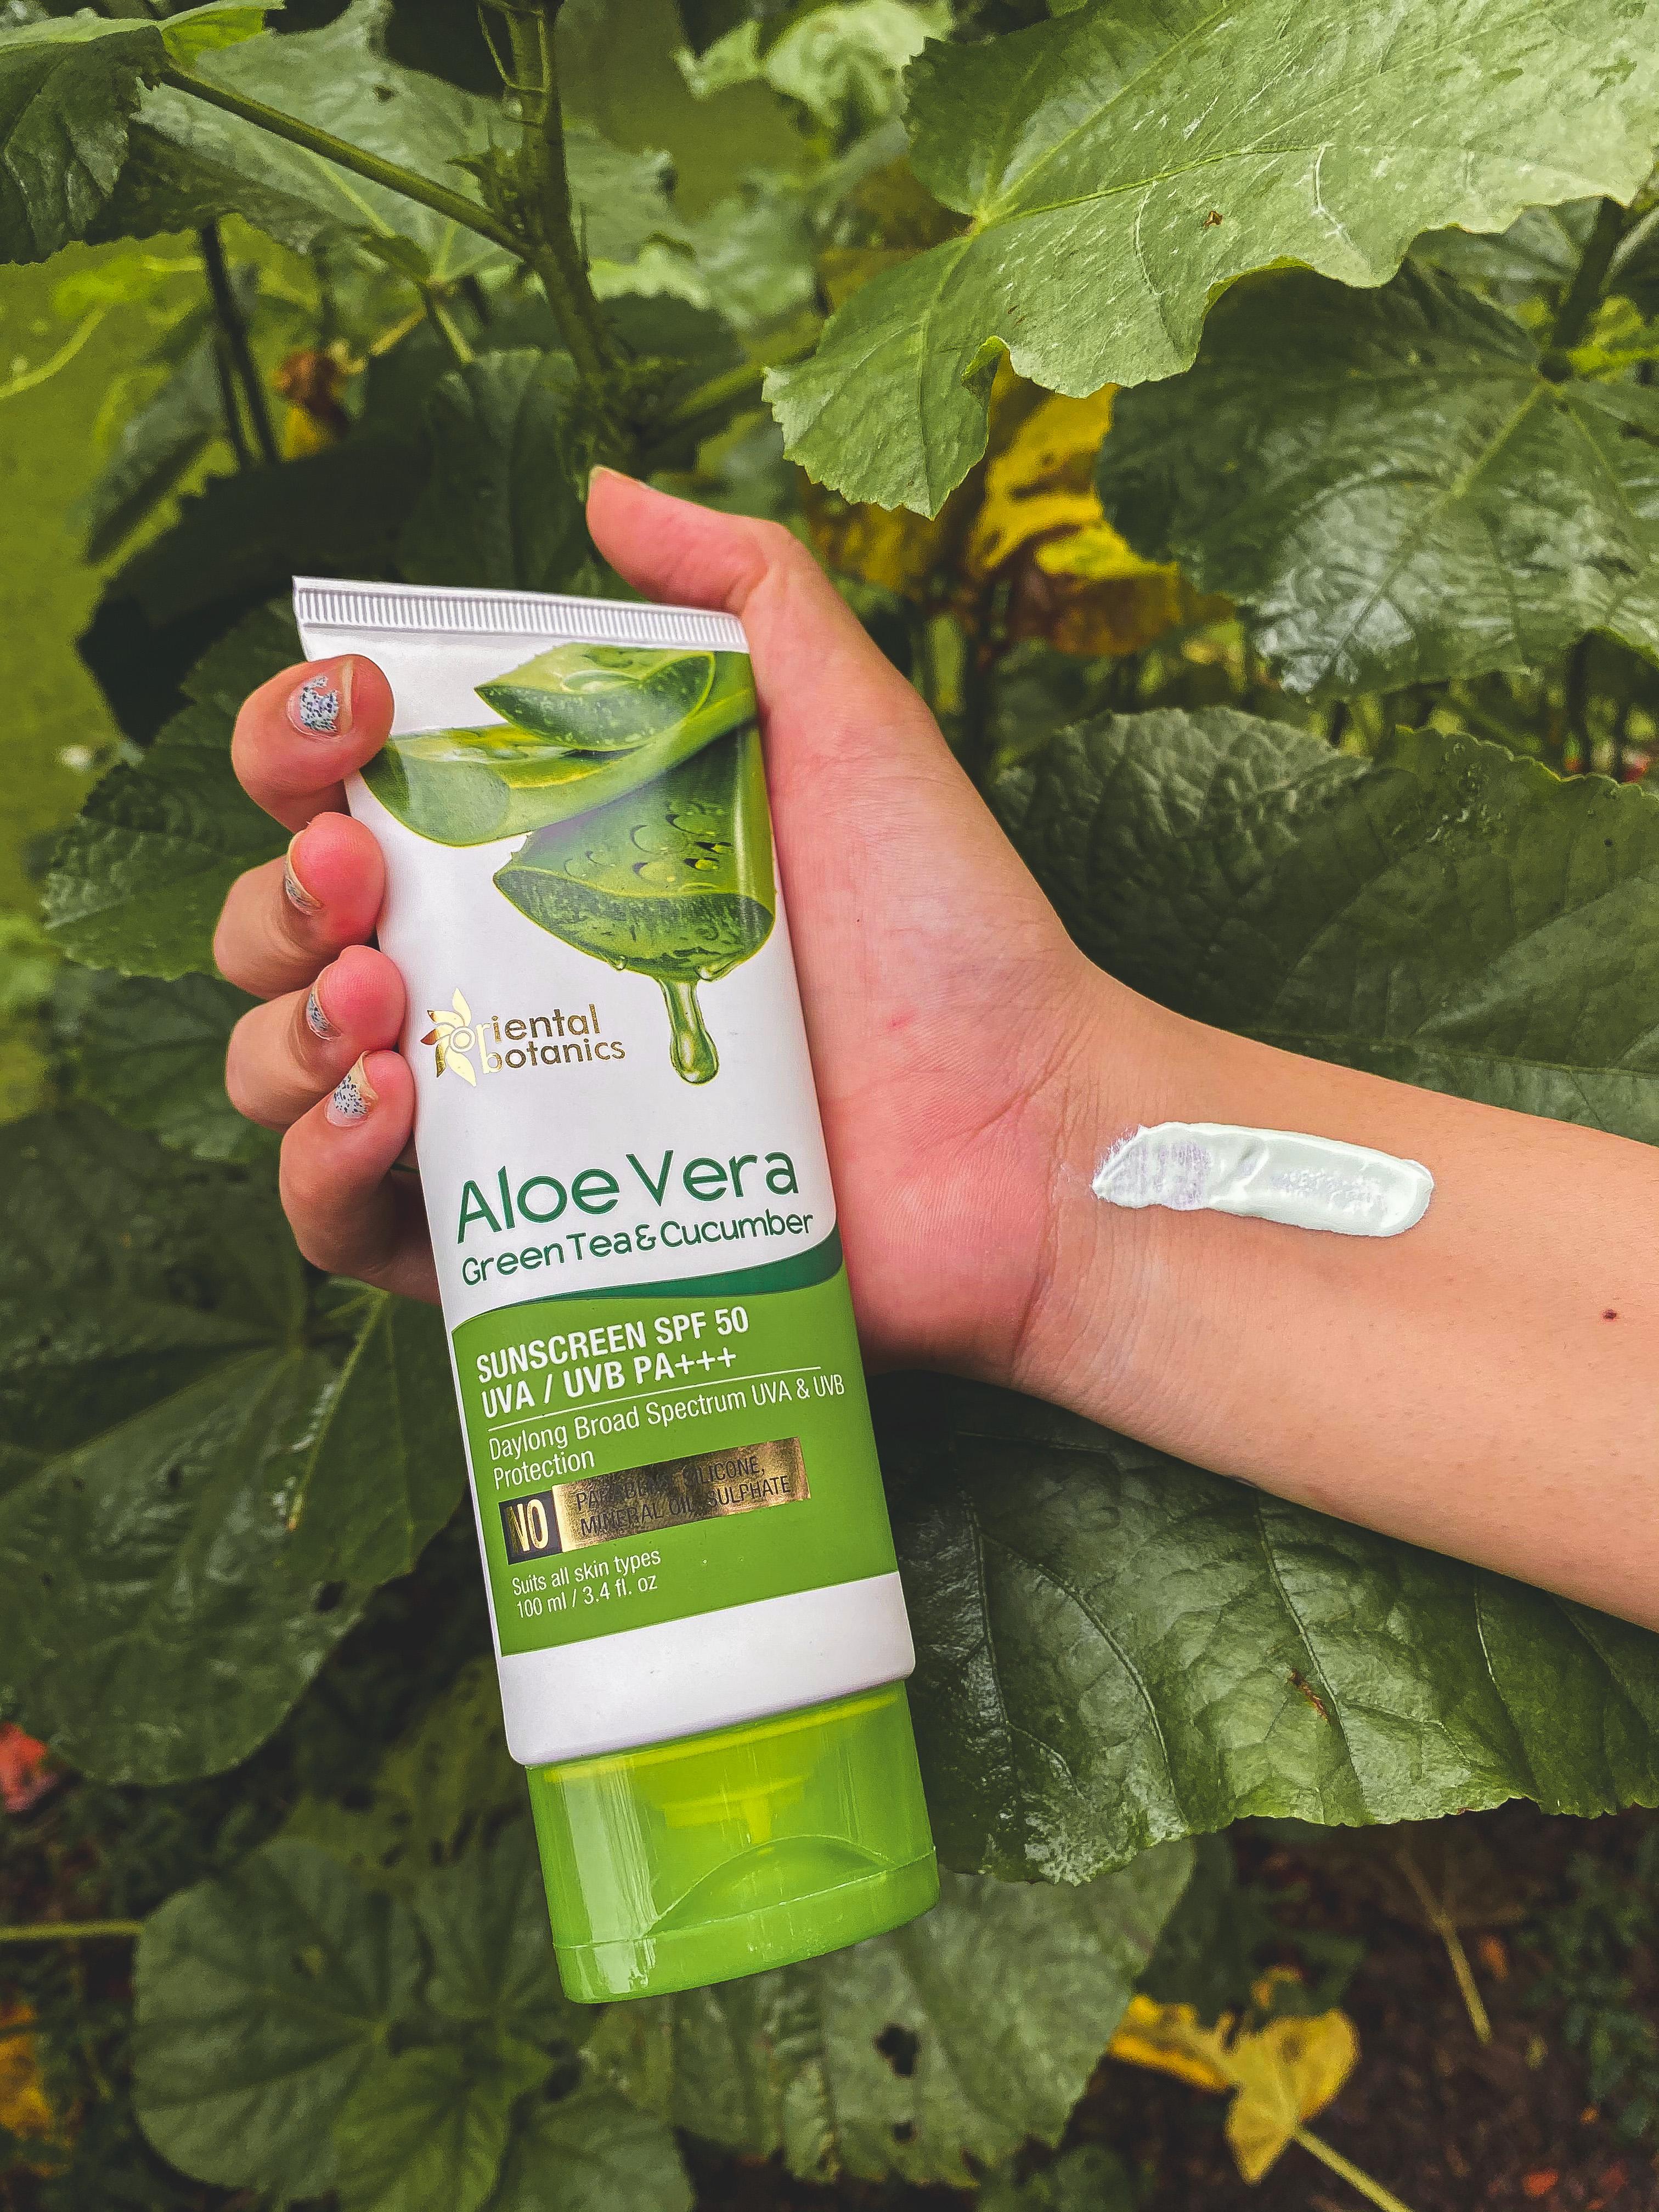 Oriental Botanics Aloe Vera Green Tea & Cucumber Sunscreen SPF 50-Lovely product-By mansigandhi98